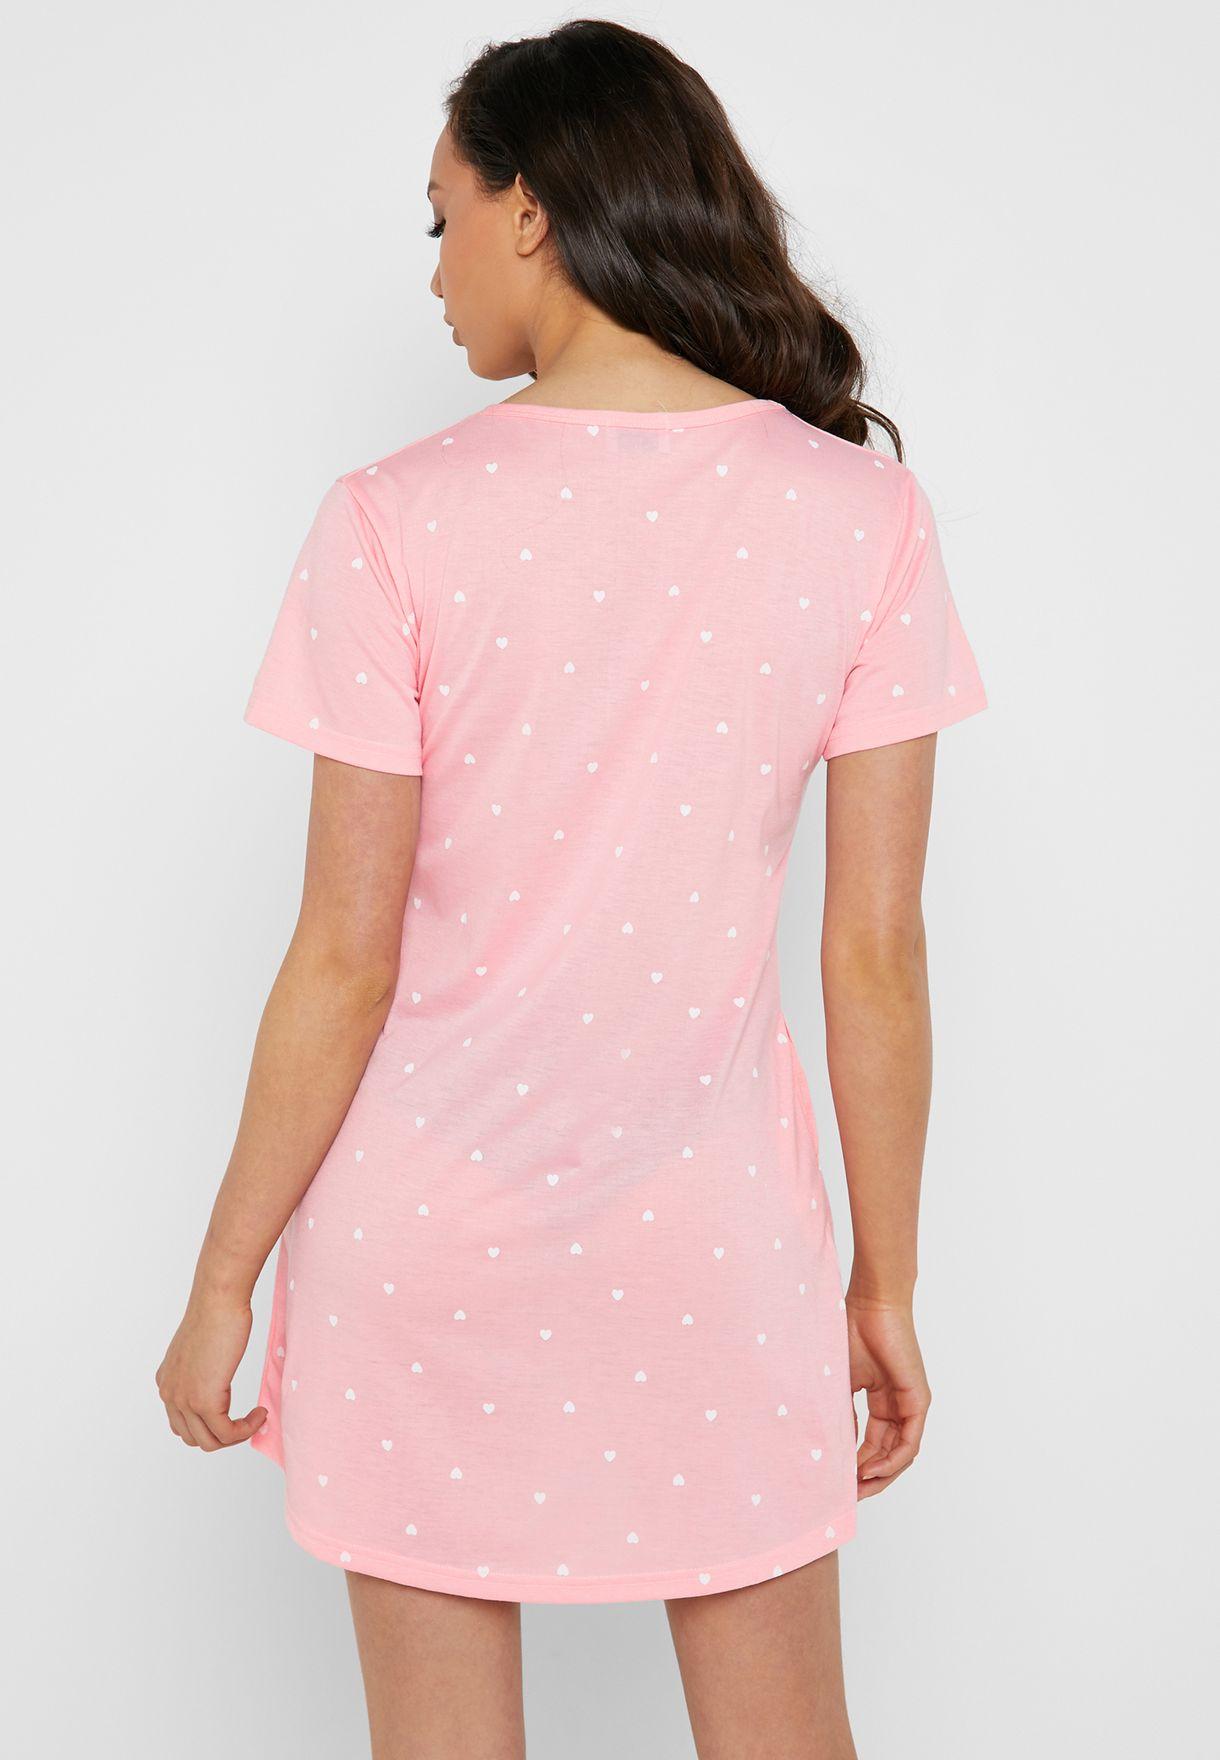 Slogan Heart Print Nightdress